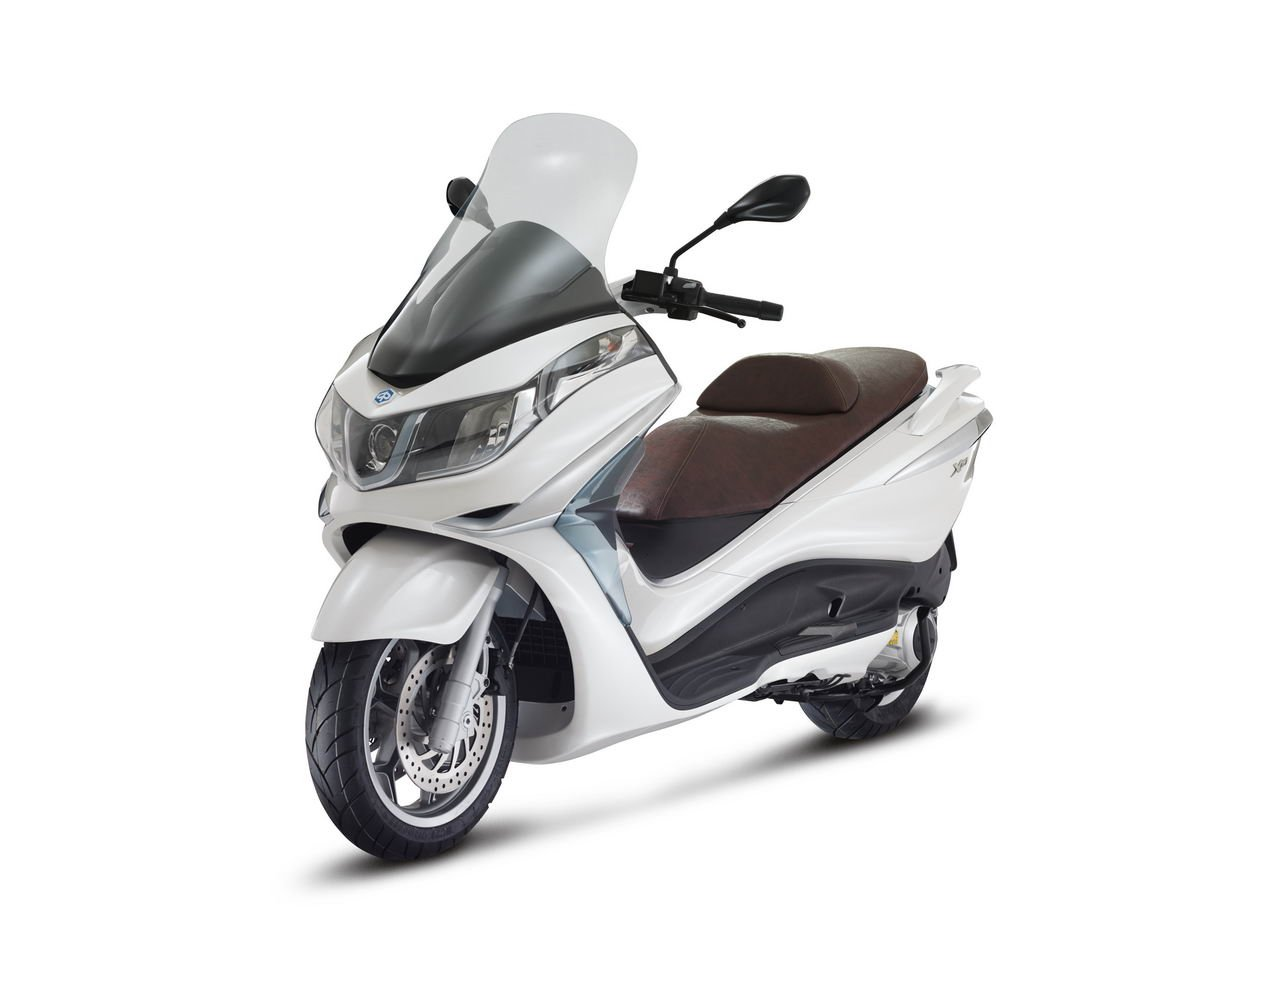 Listino Piaggio Beverly Sport Touring 350 ie Scooter oltre 300 - image 15145_piaggio-x10-executive-500 on http://moto.motori.net